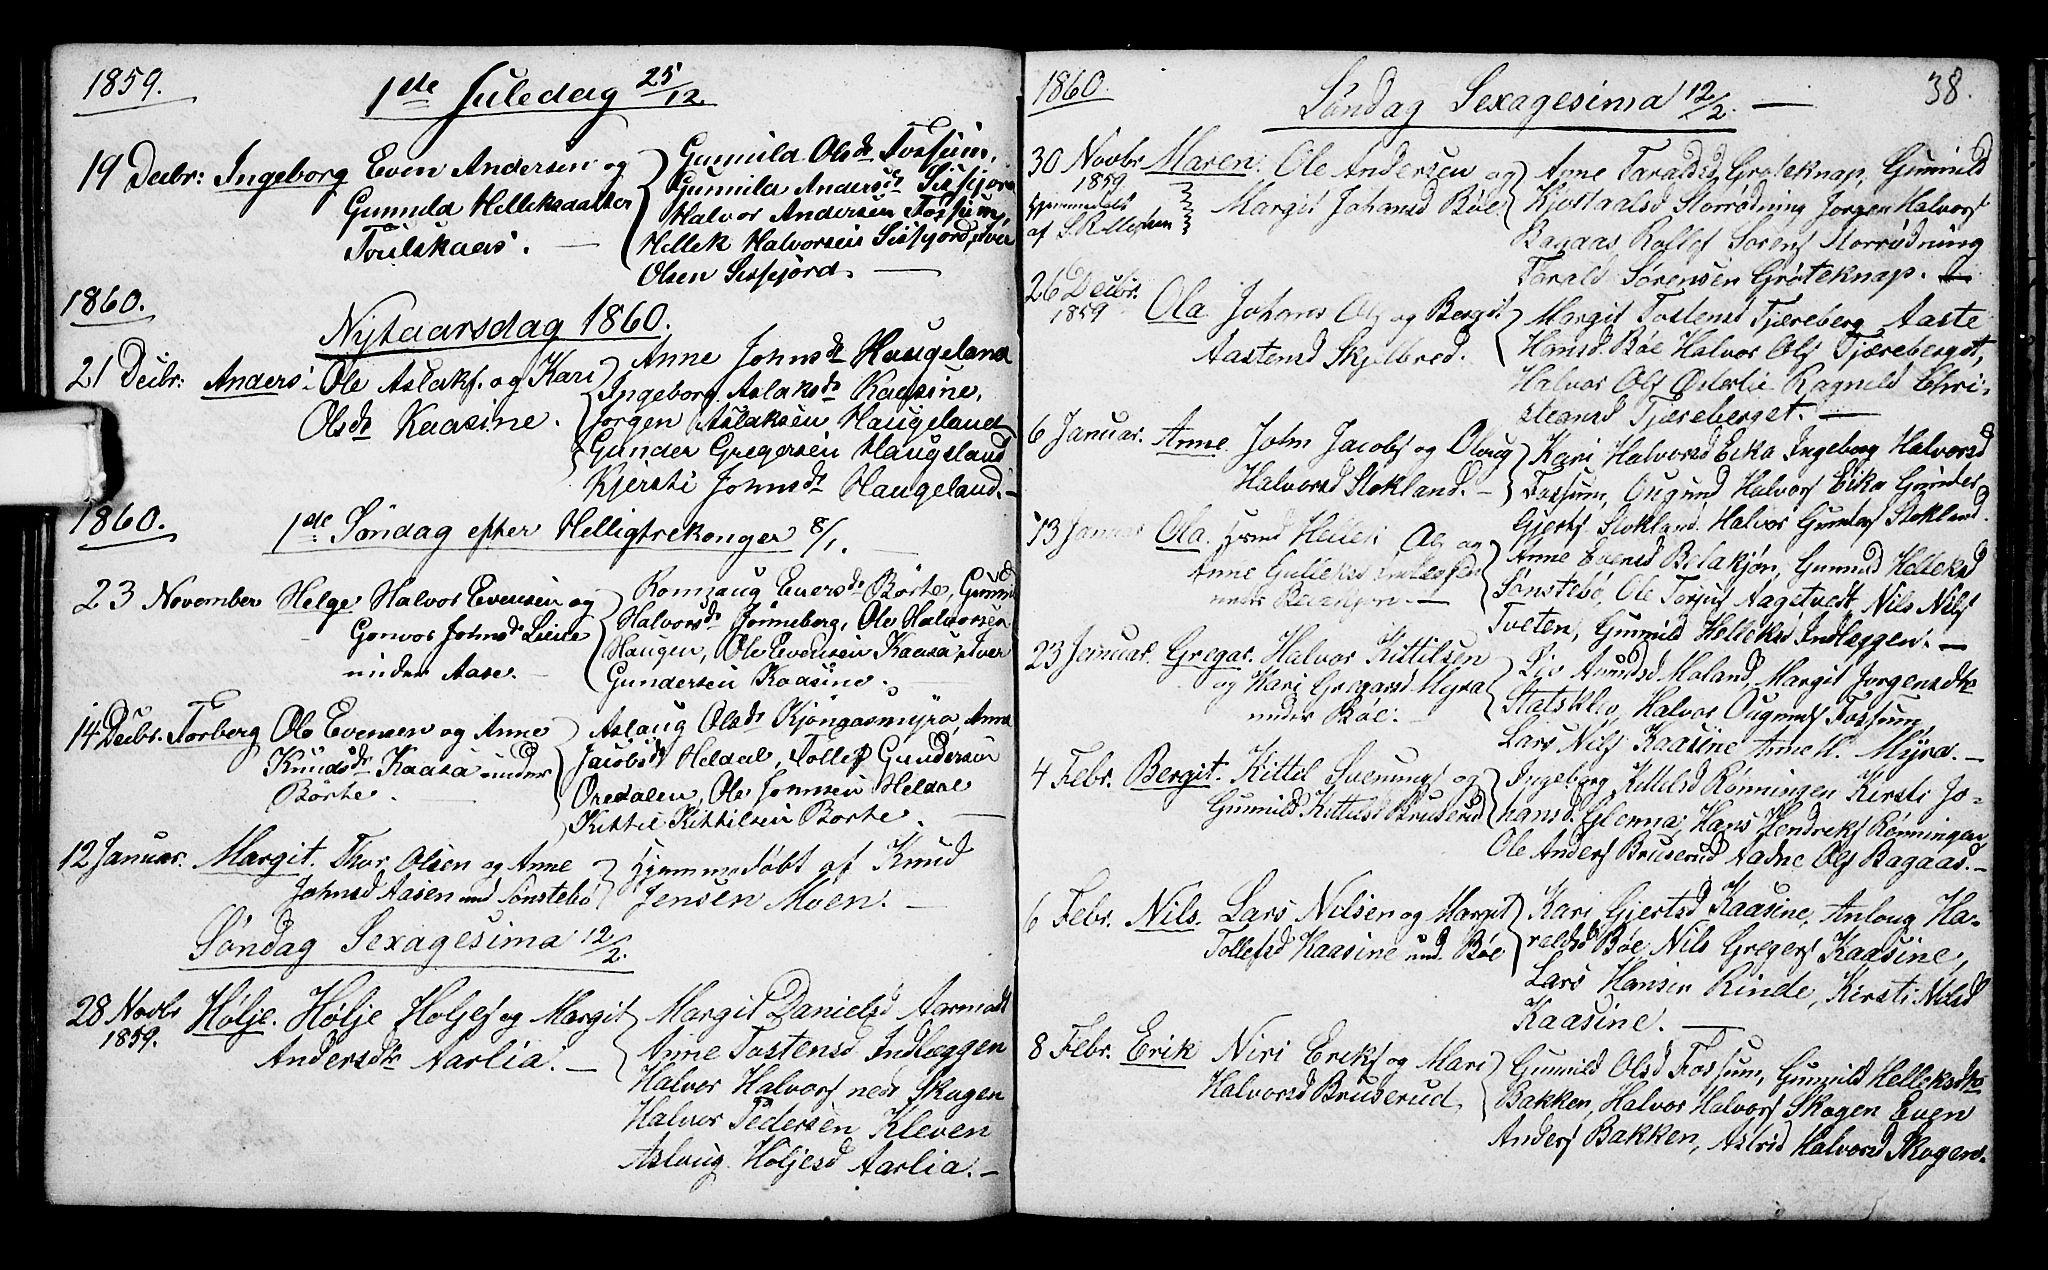 SAKO, Bø kirkebøker, G/Ga/L0002: Klokkerbok nr. 2, 1853-1866, s. 38